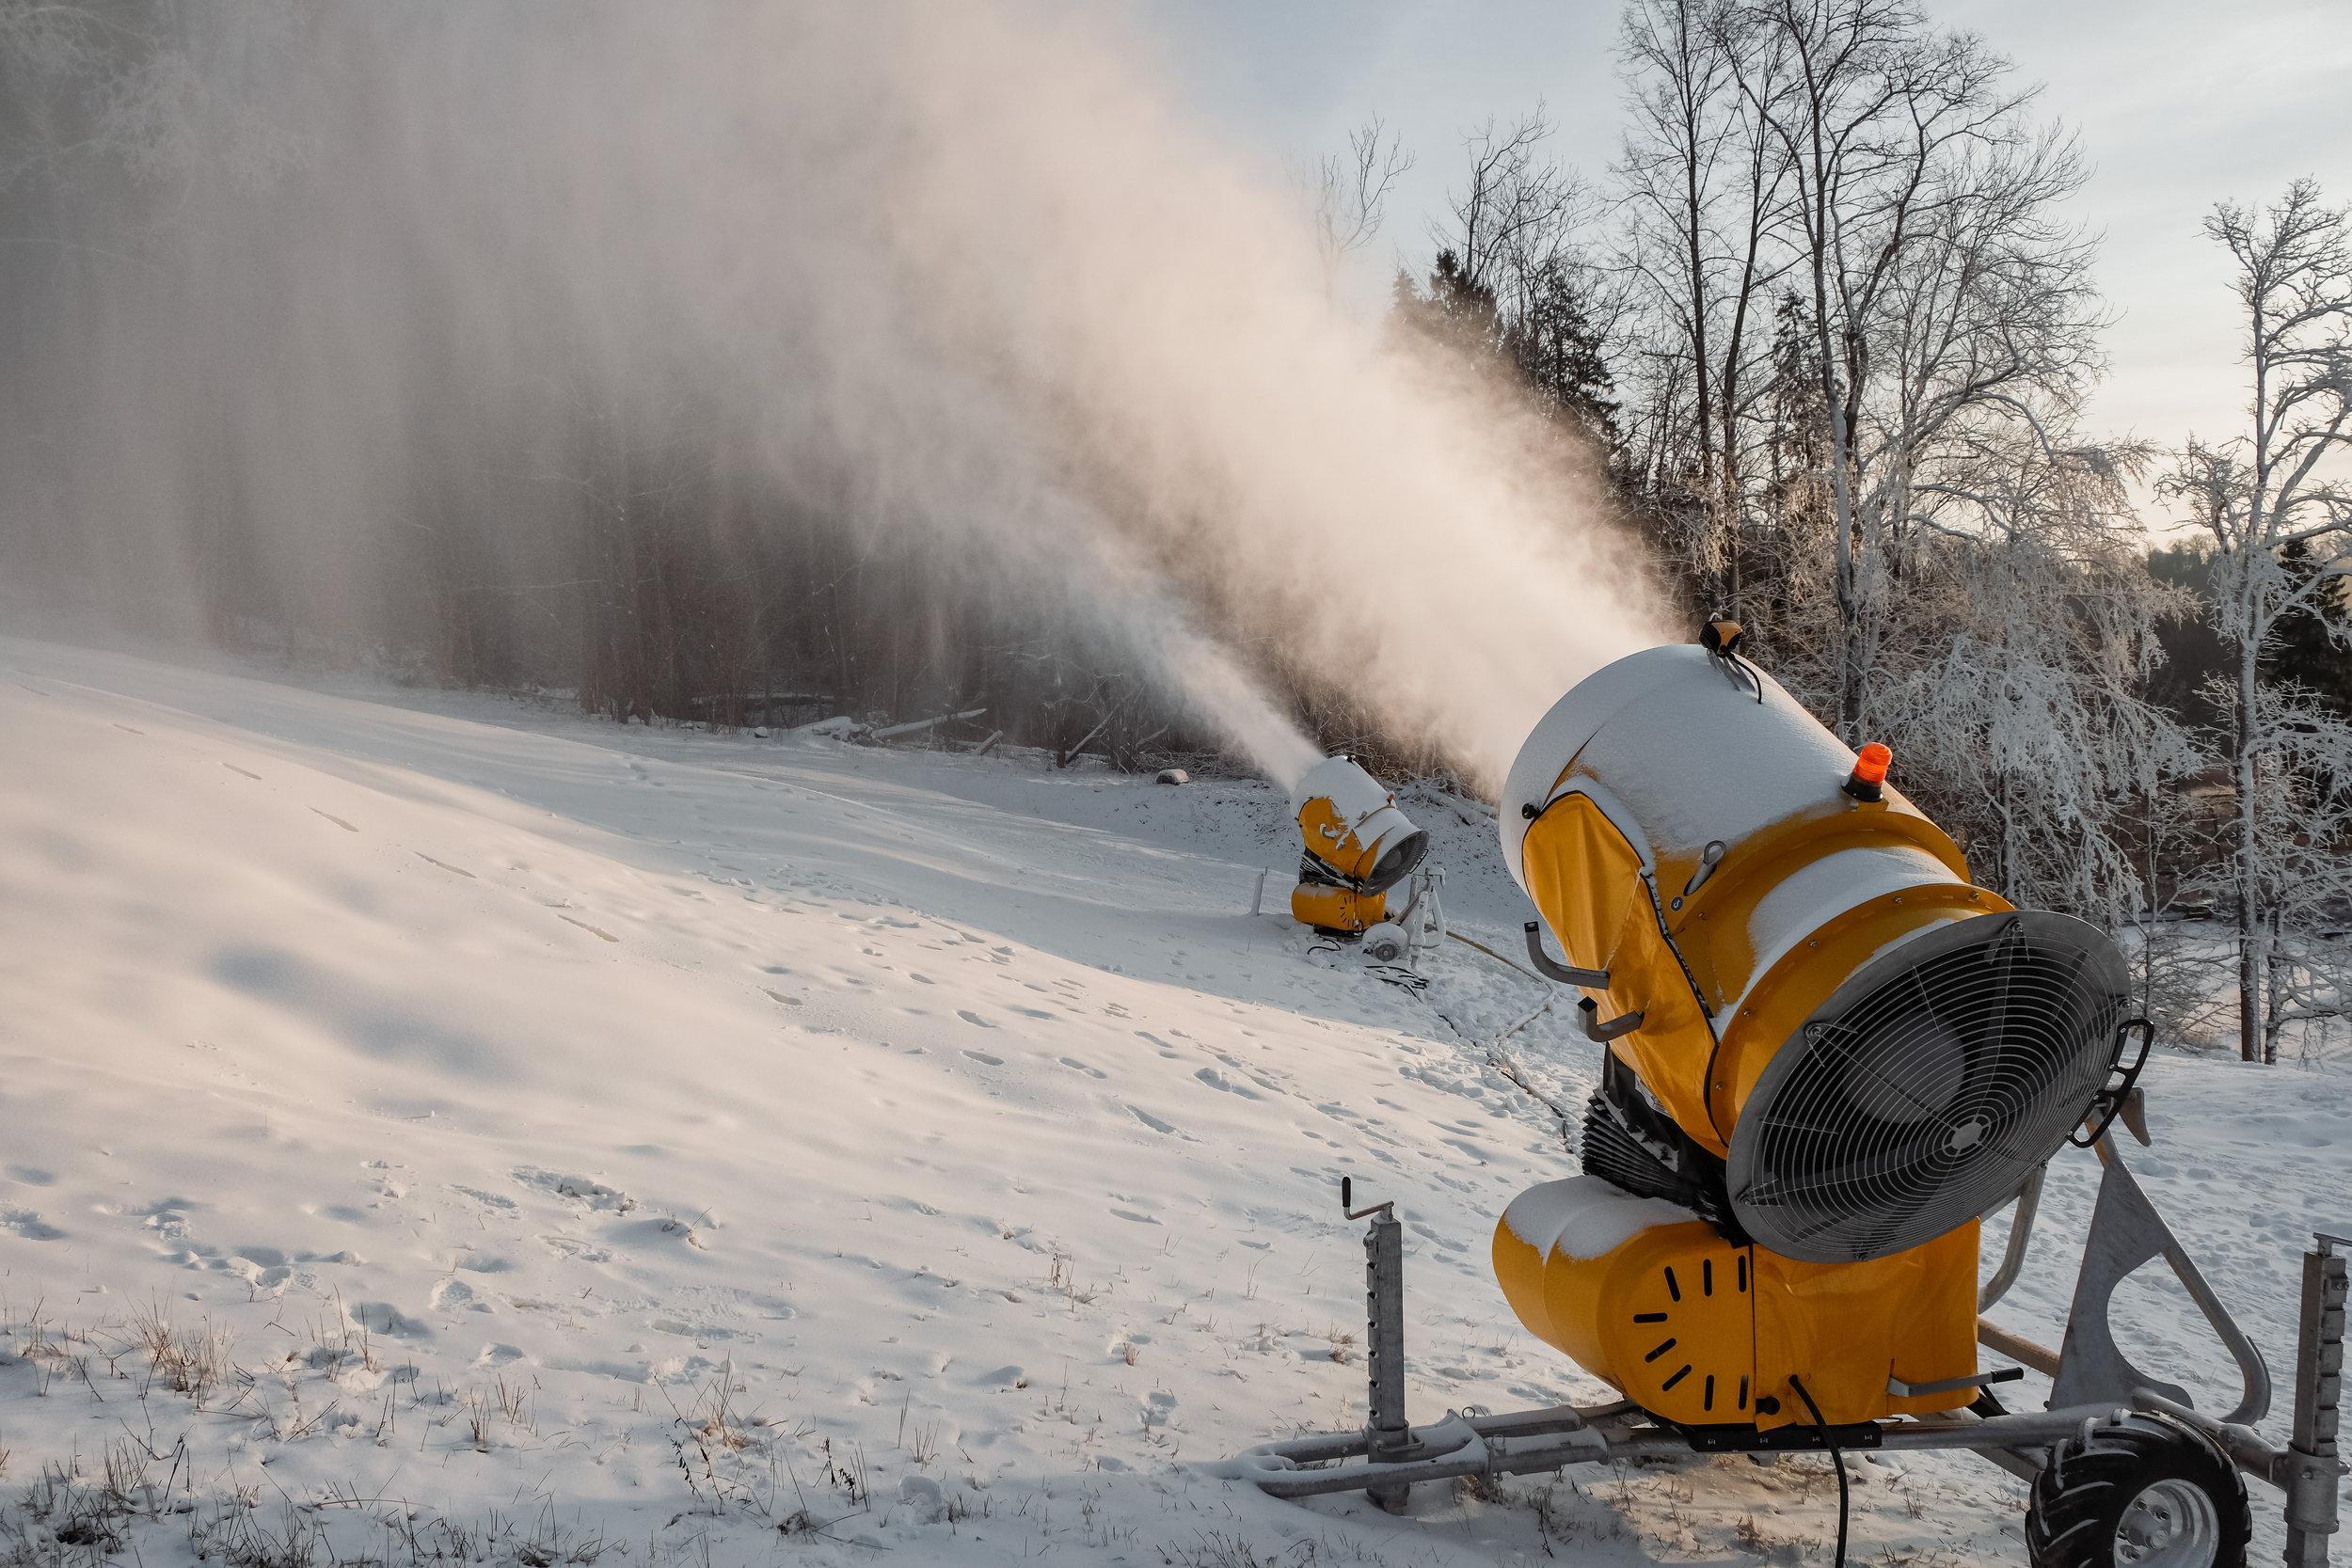 Cross Country Snow Making Equipment